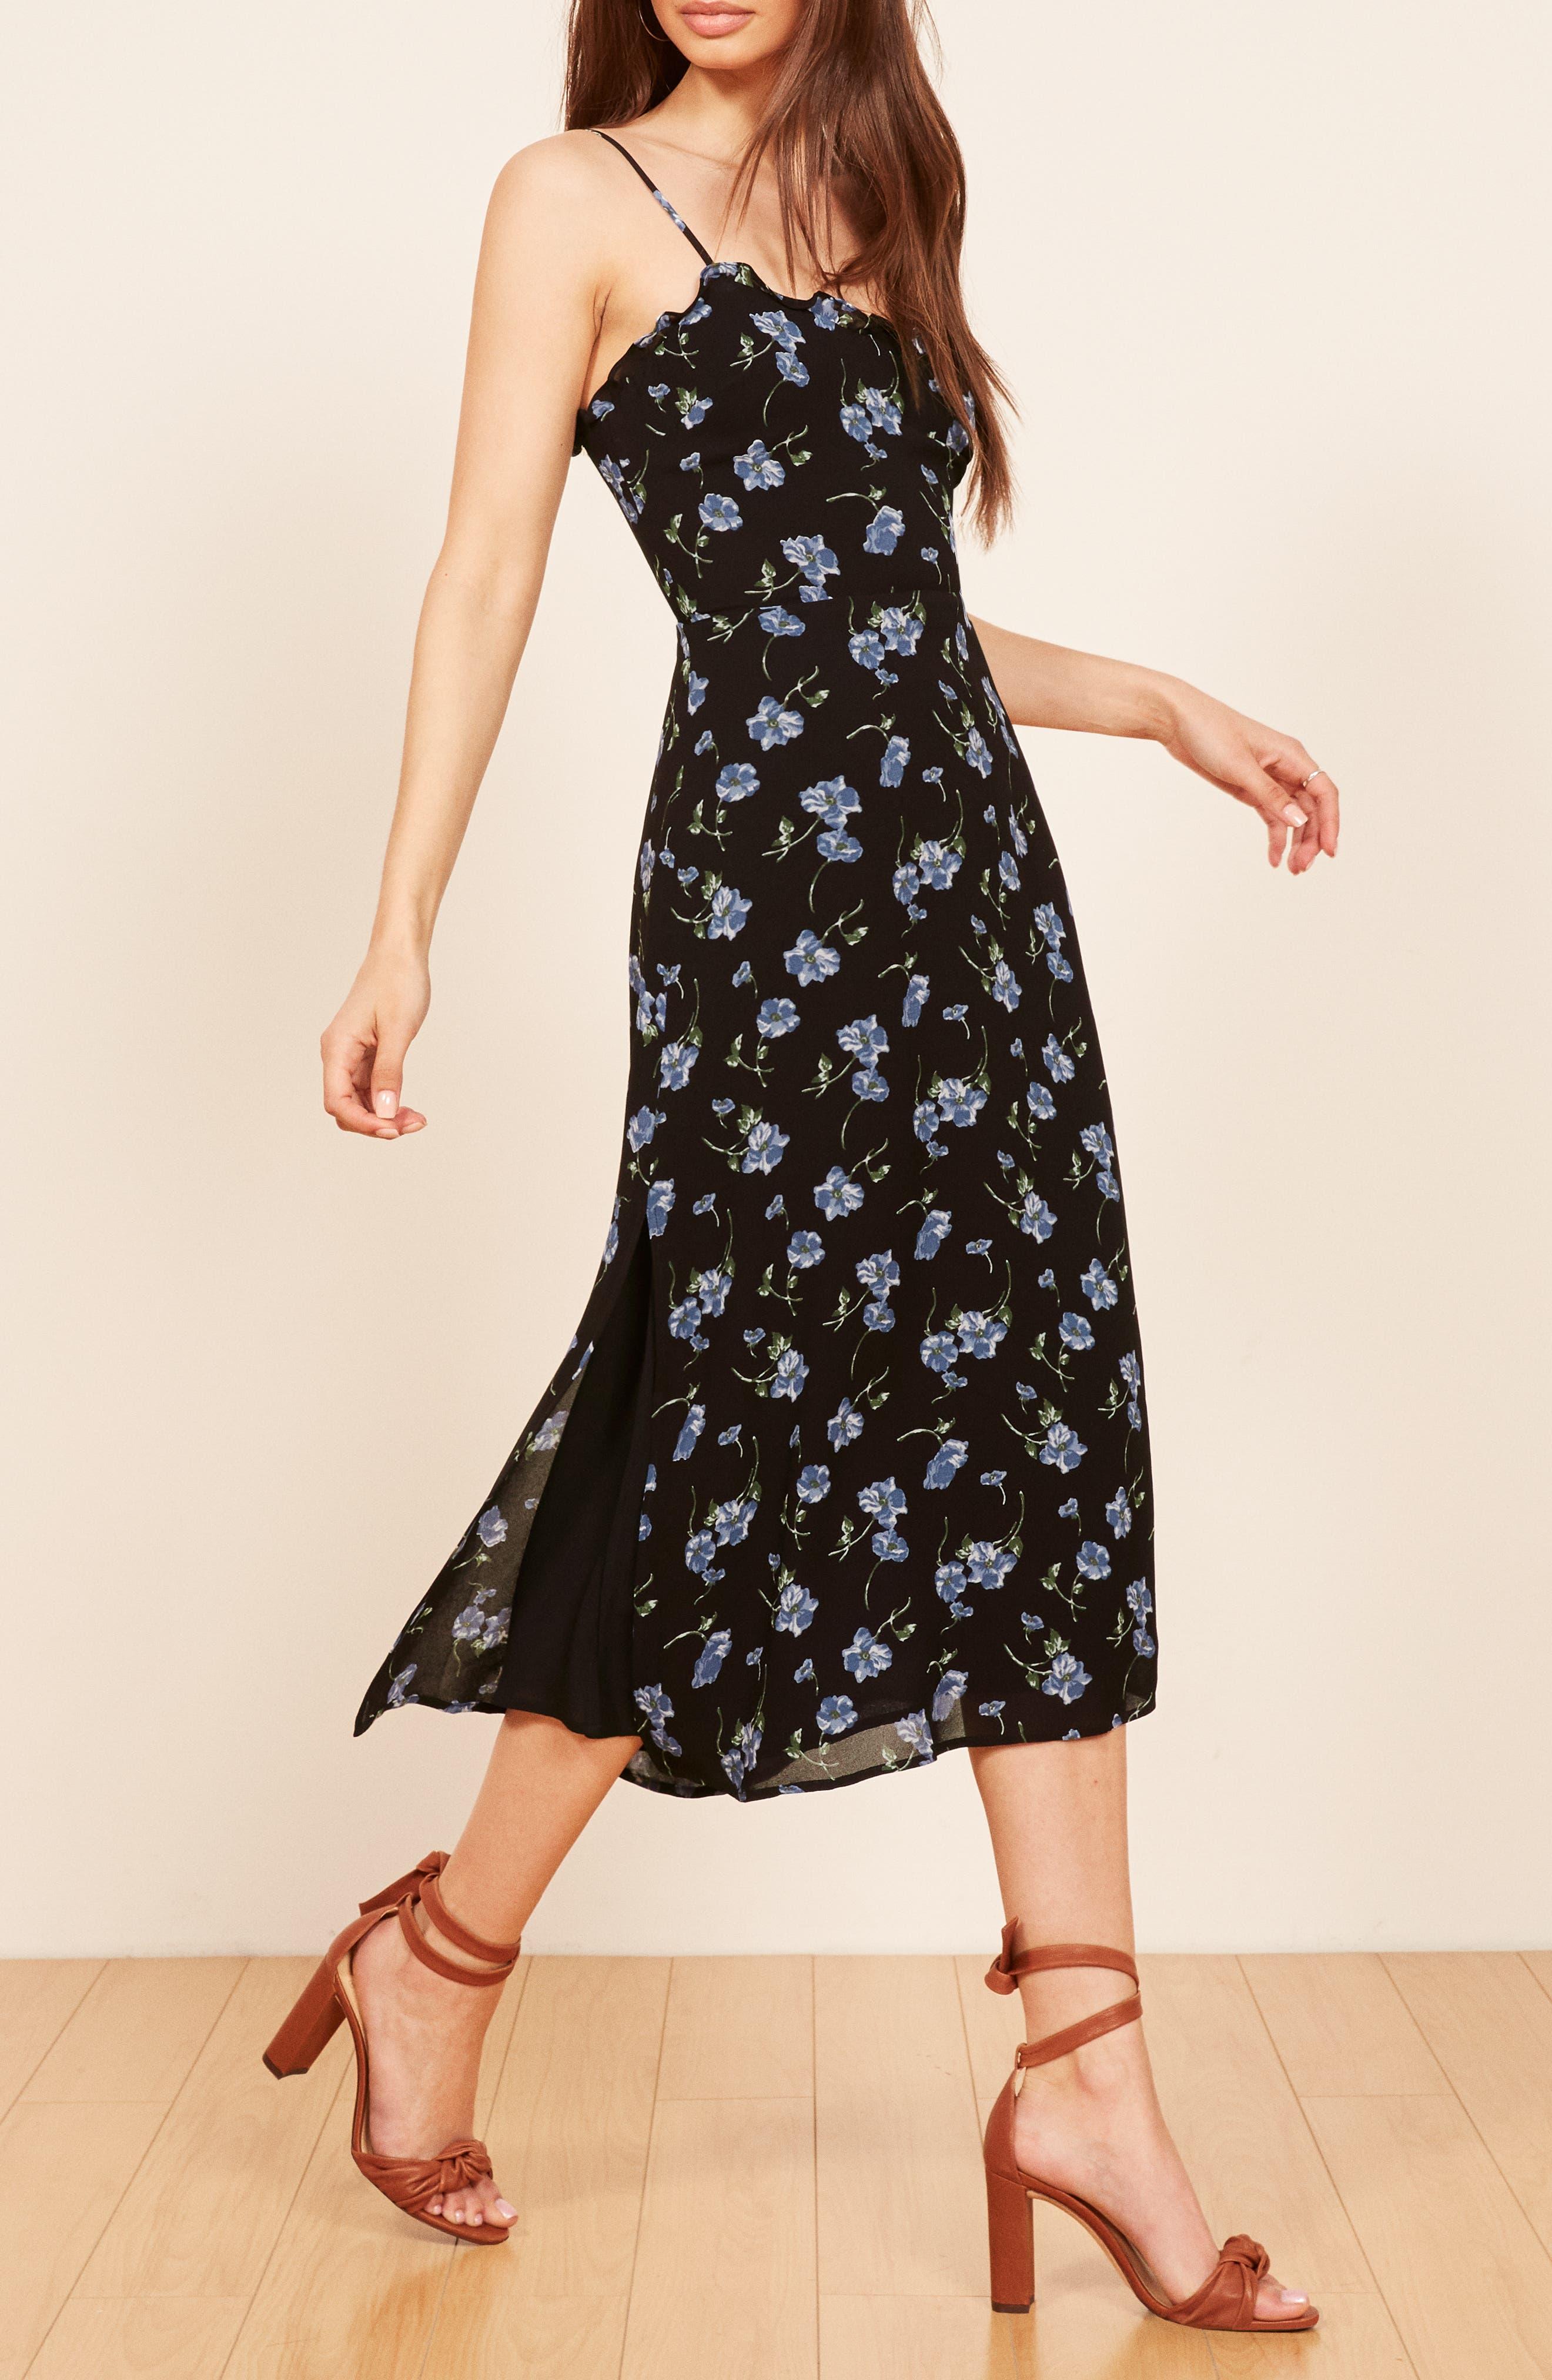 REFORMATION, Cassandra Floral Dress, Alternate thumbnail 5, color, 001